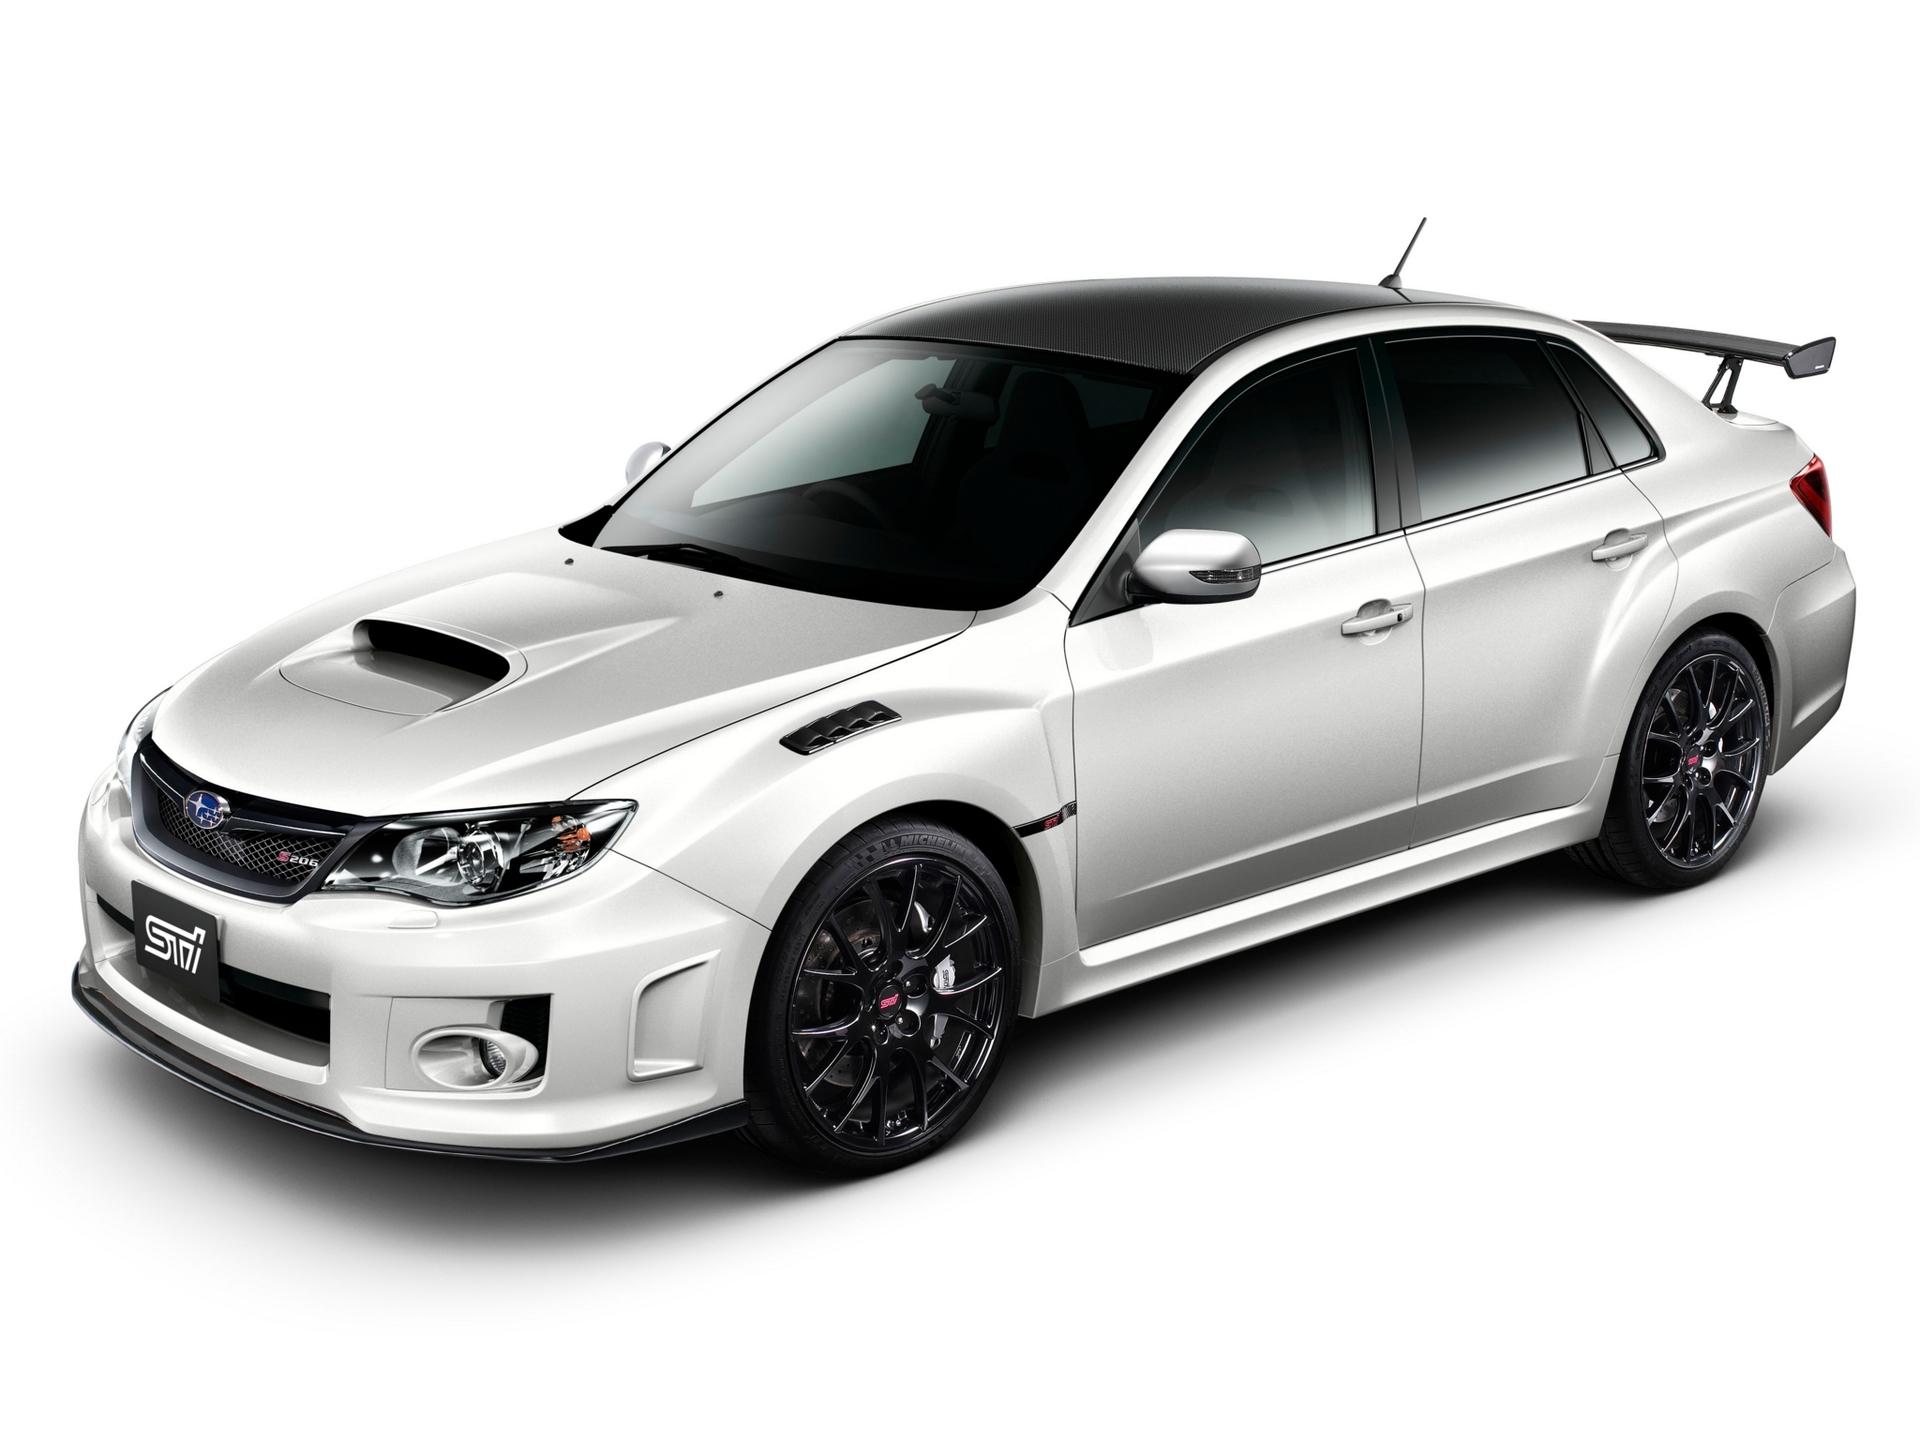 Subaru_Impreza_STI_S206_NBR_Challenge_Package_0000